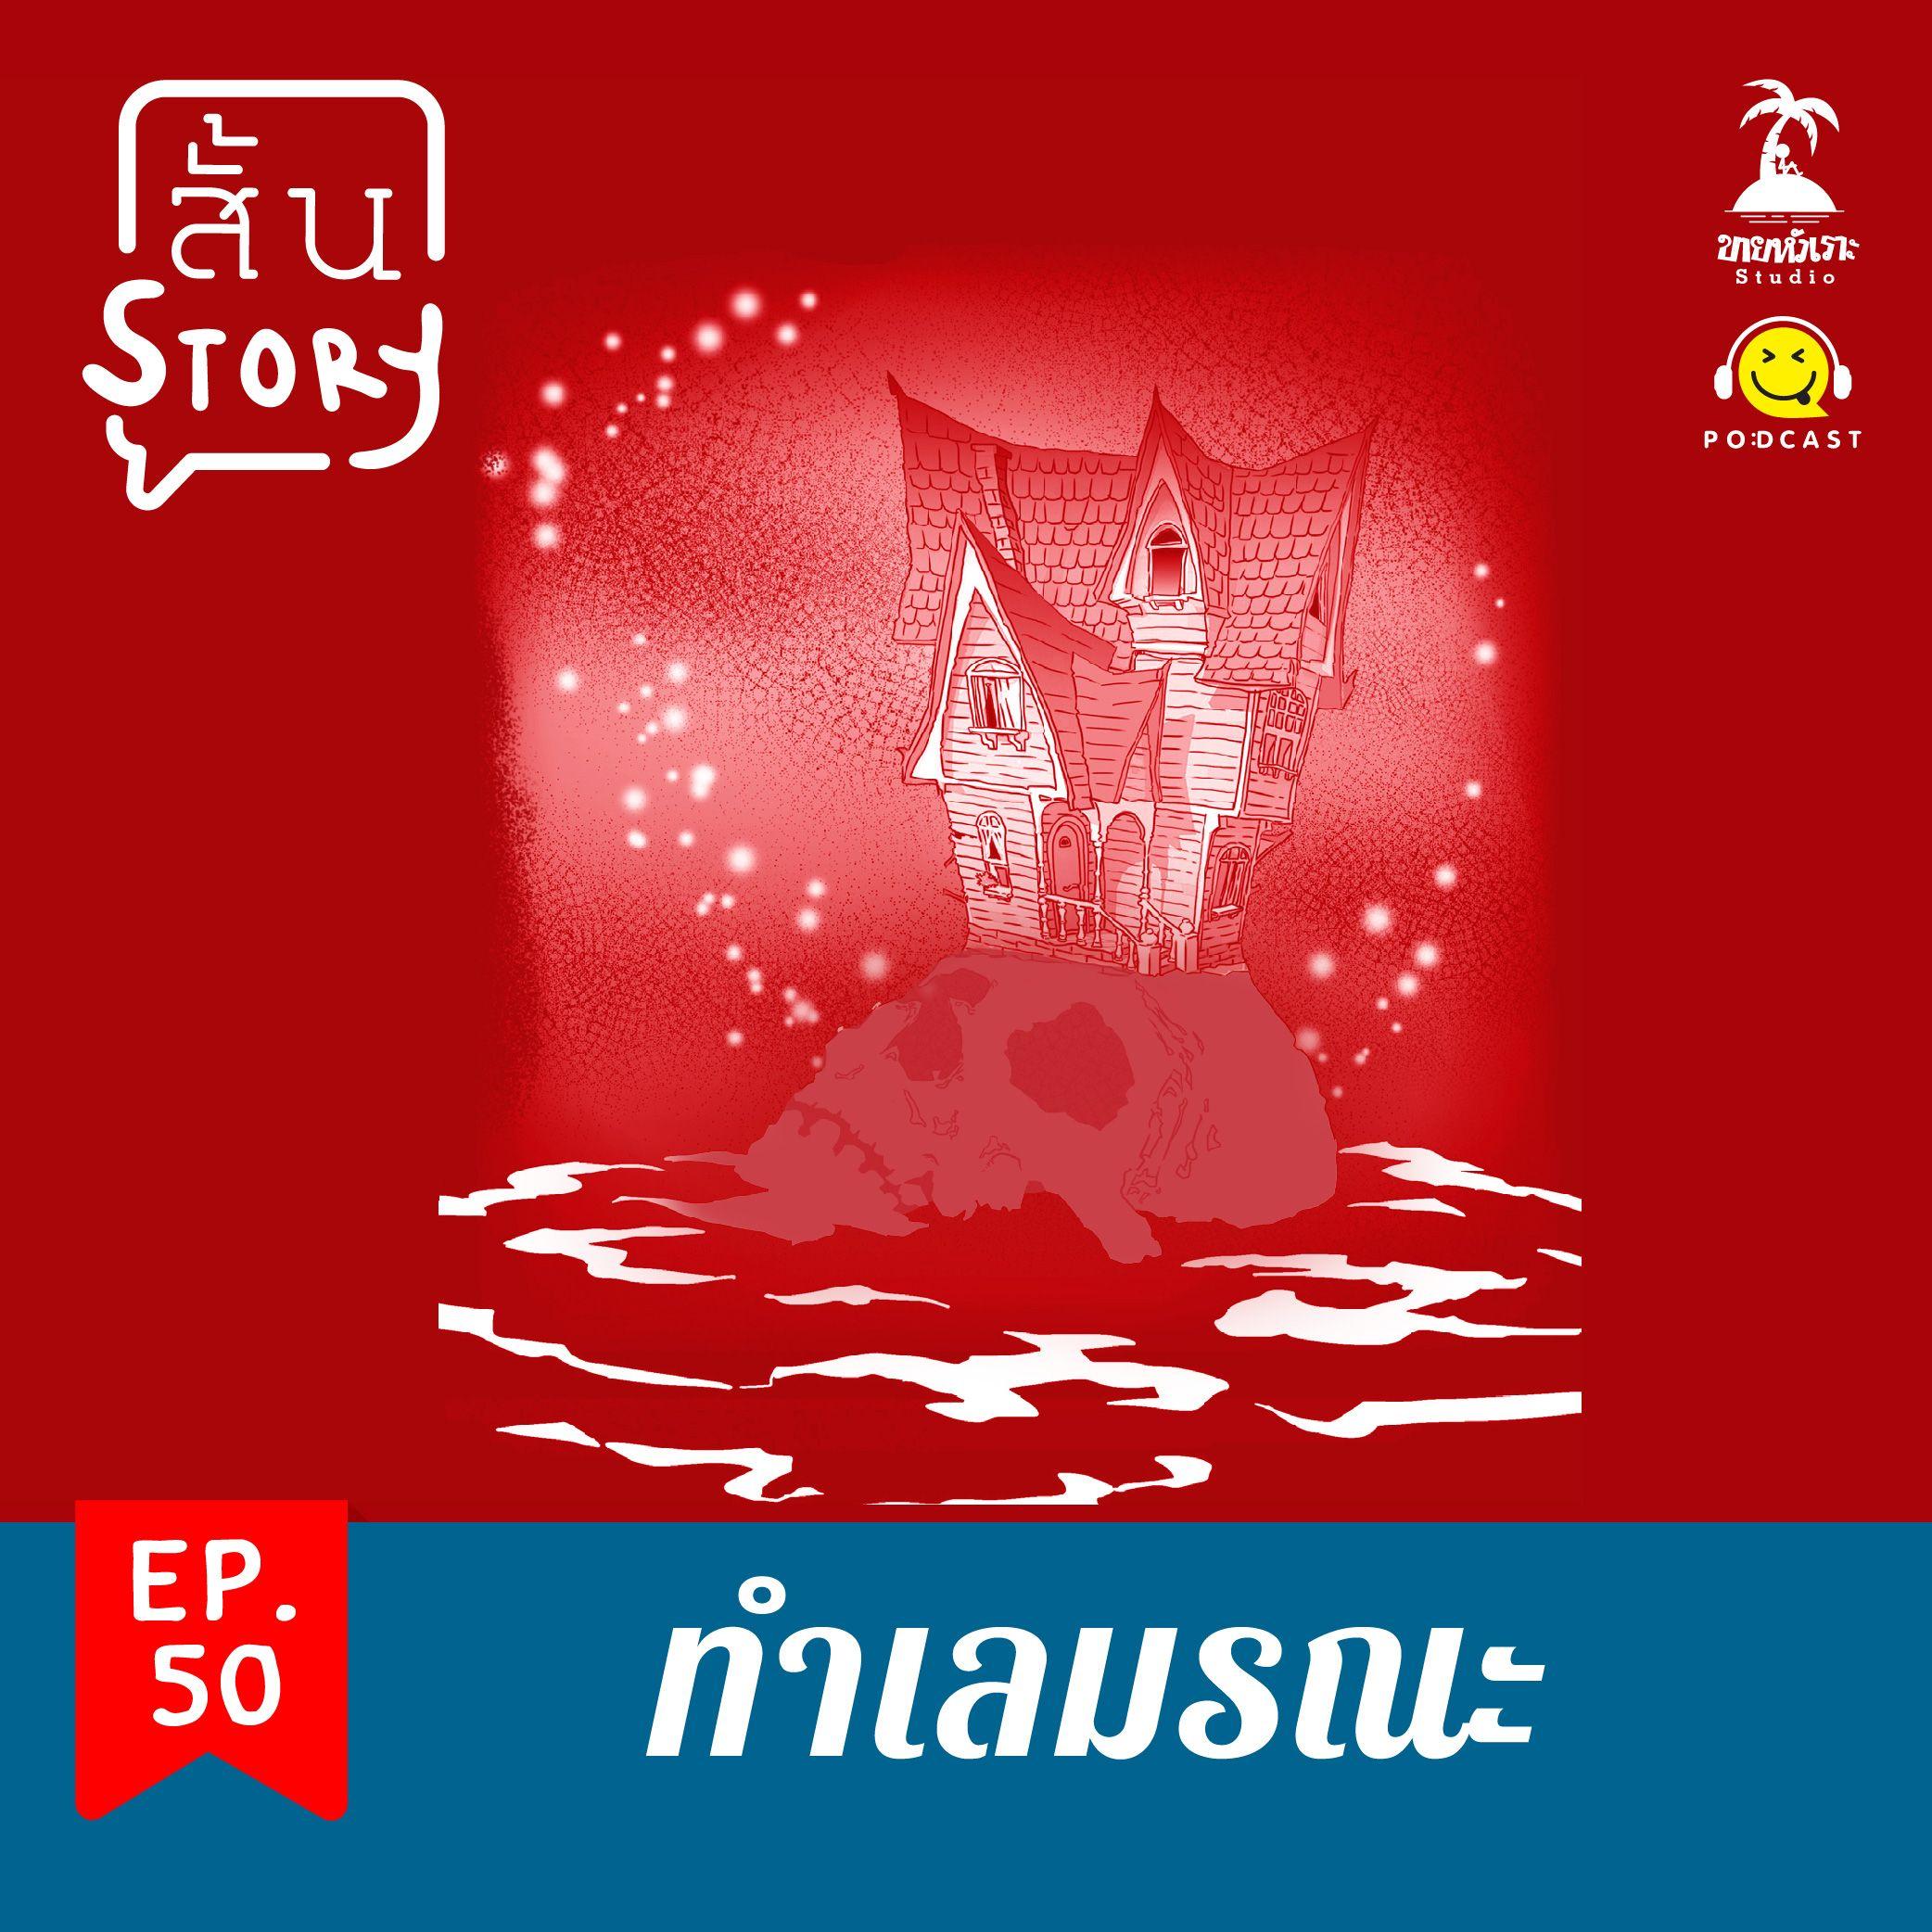 STR EP.50 เรื่องสั้นขายหัวเราะ : ทำเลมรณะ